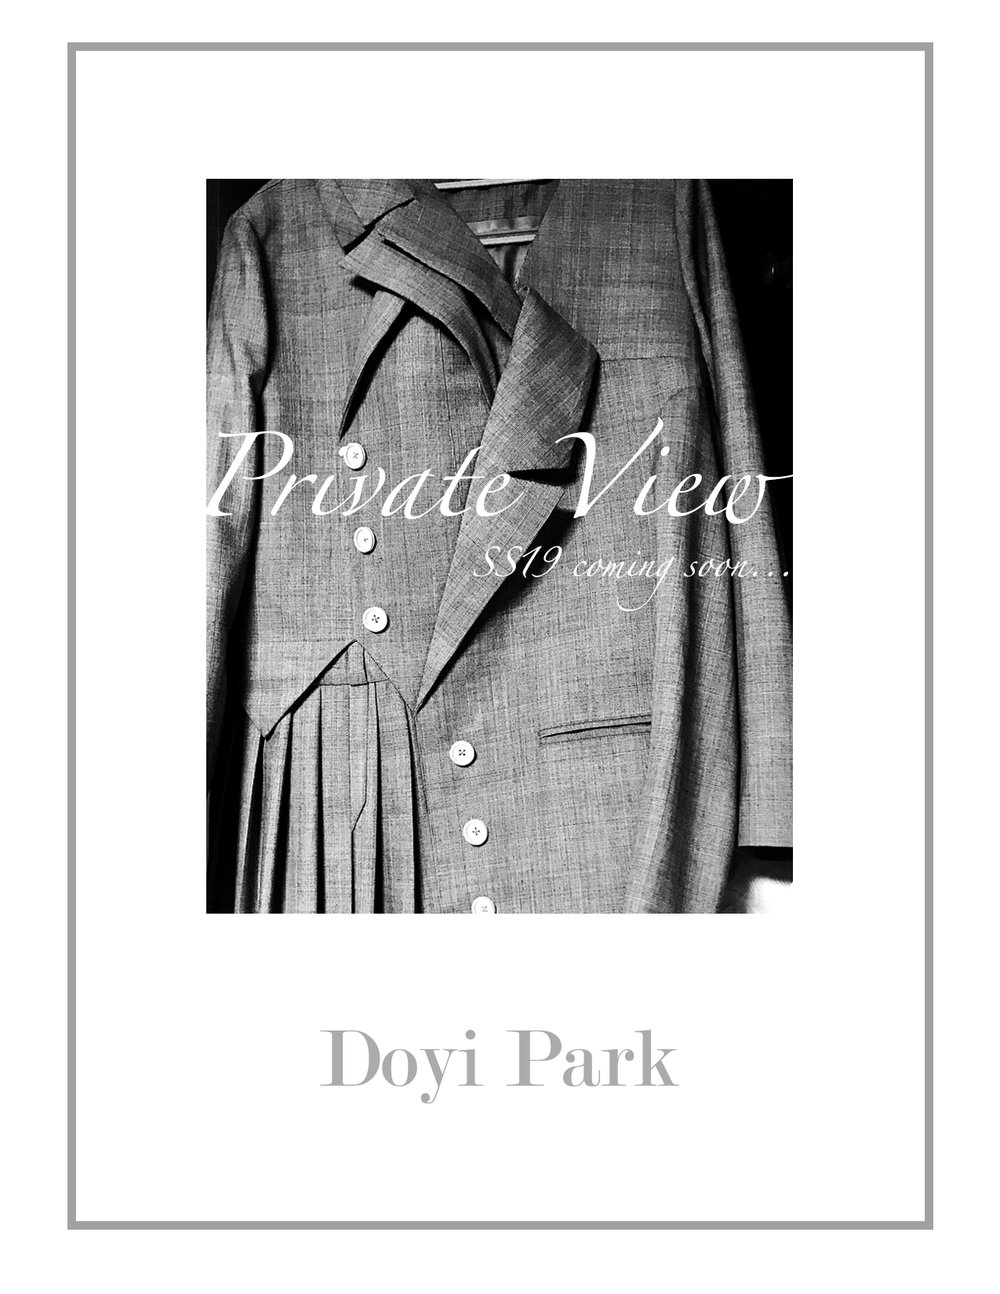 Doyi Park web.jpg